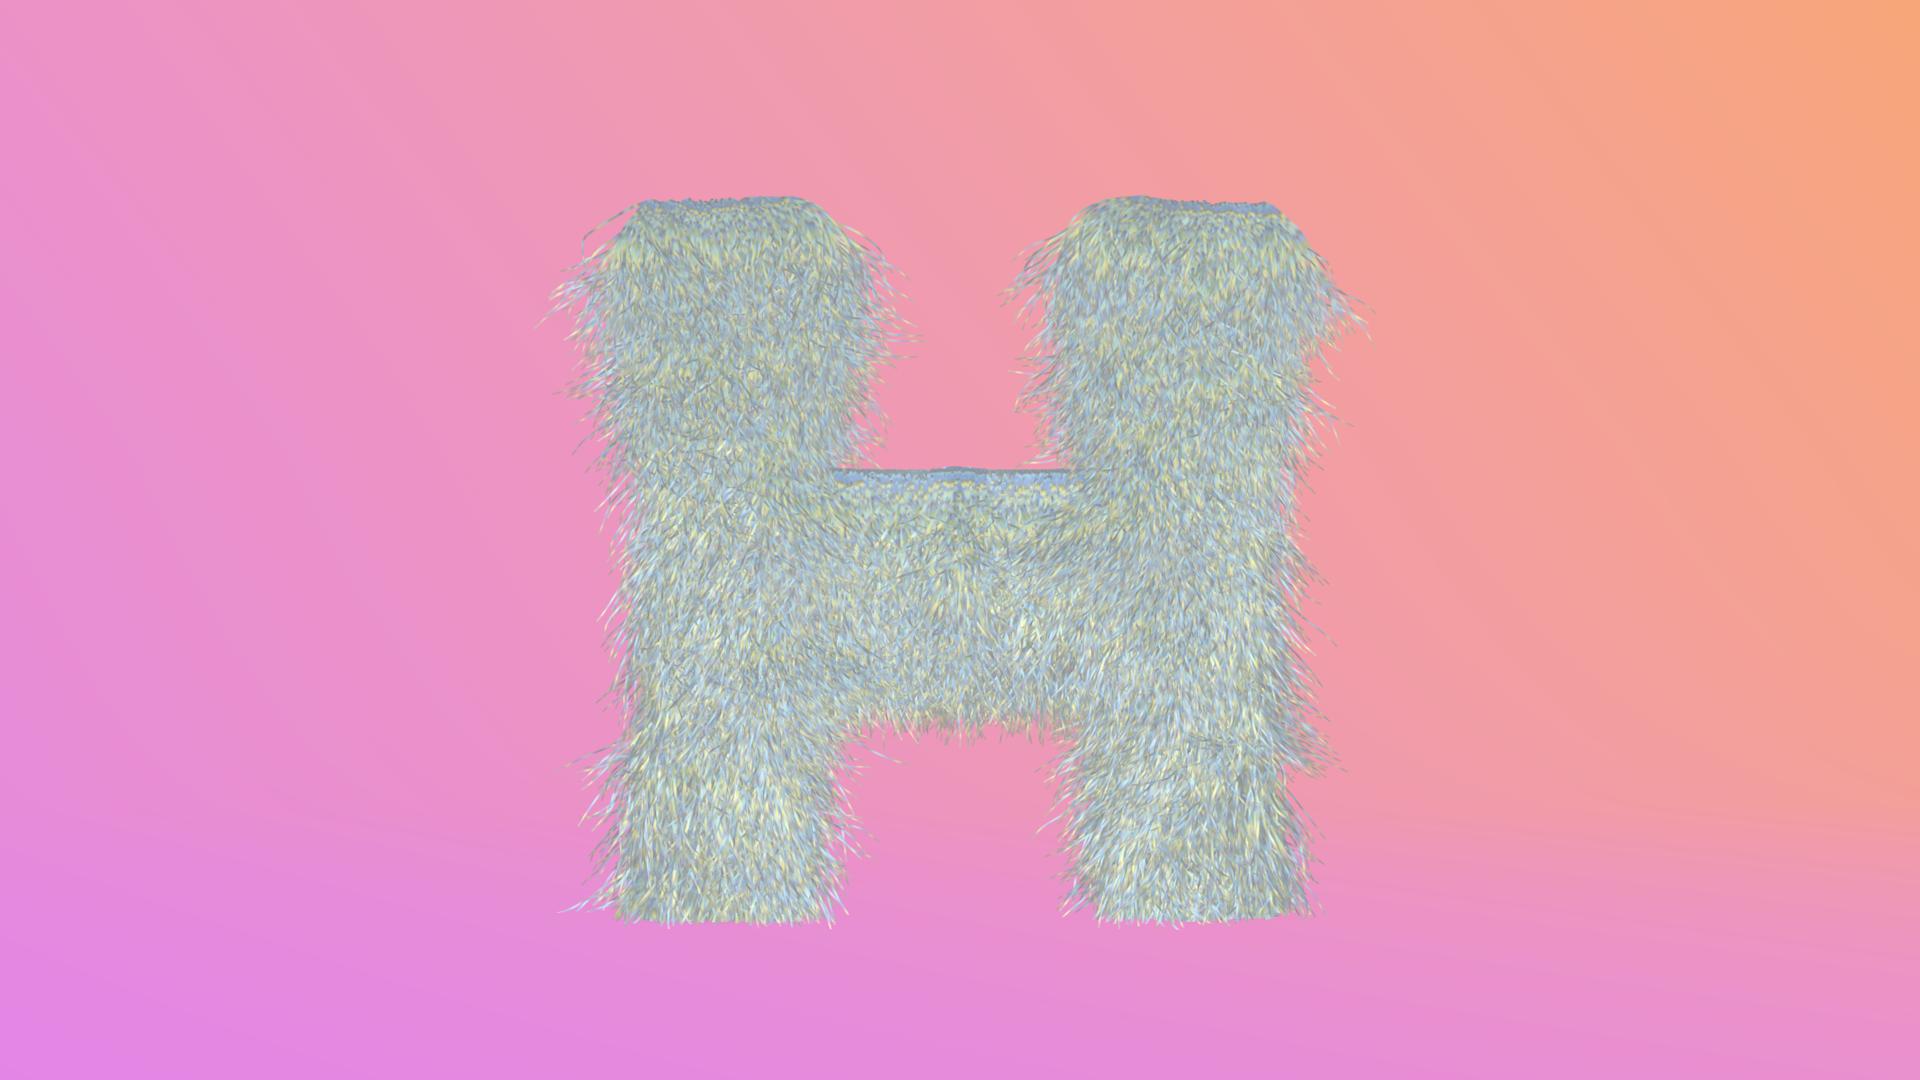 Hv3_0030.png